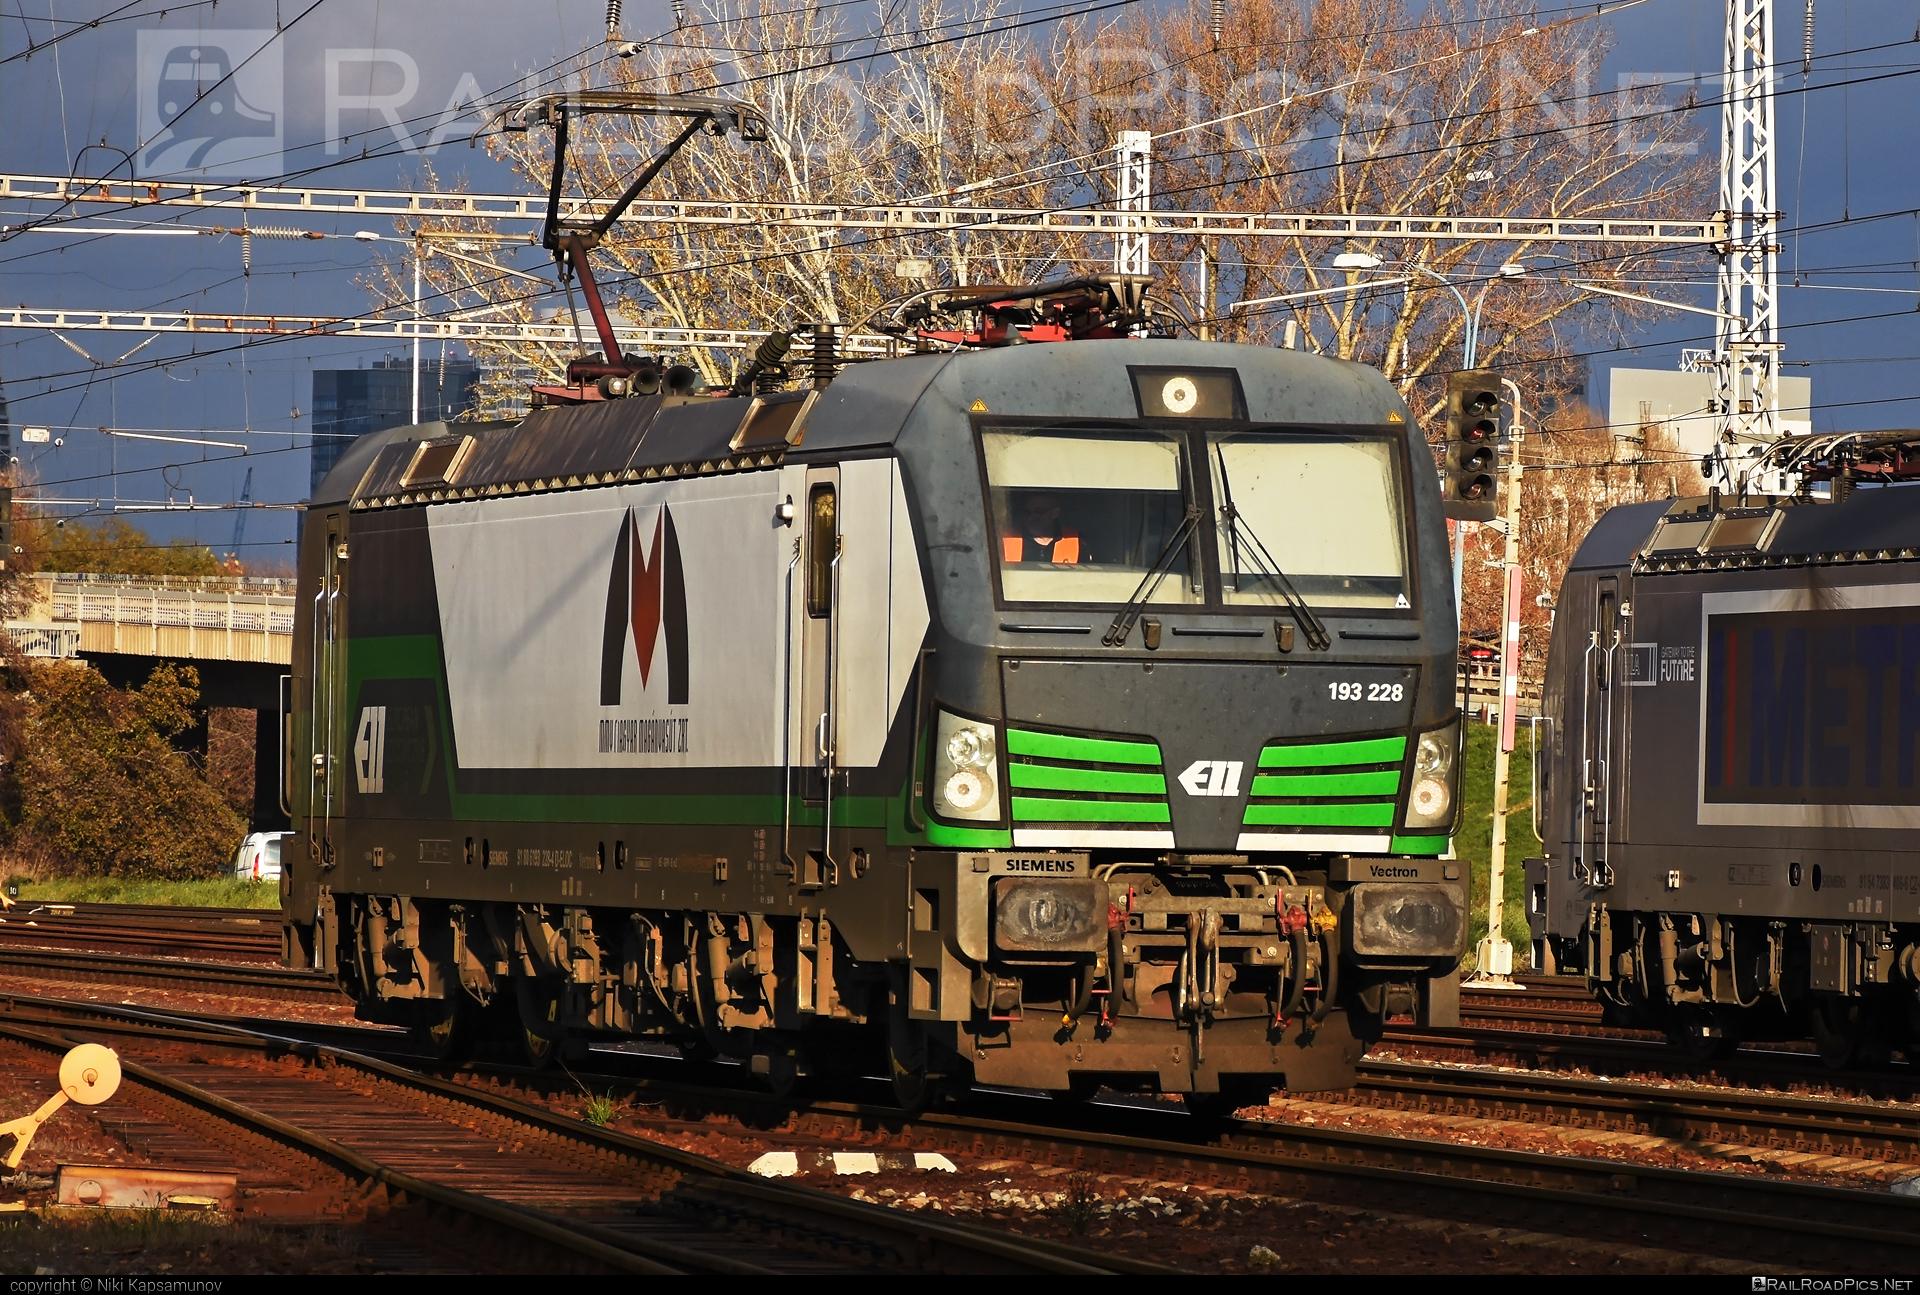 Siemens Vectron AC - 193 228 operated by Magyar Magánvasút ZRt. #ell #ellgermany #eloc #europeanlocomotiveleasing #mmv #siemens #siemensvectron #siemensvectronac #vectron #vectronac